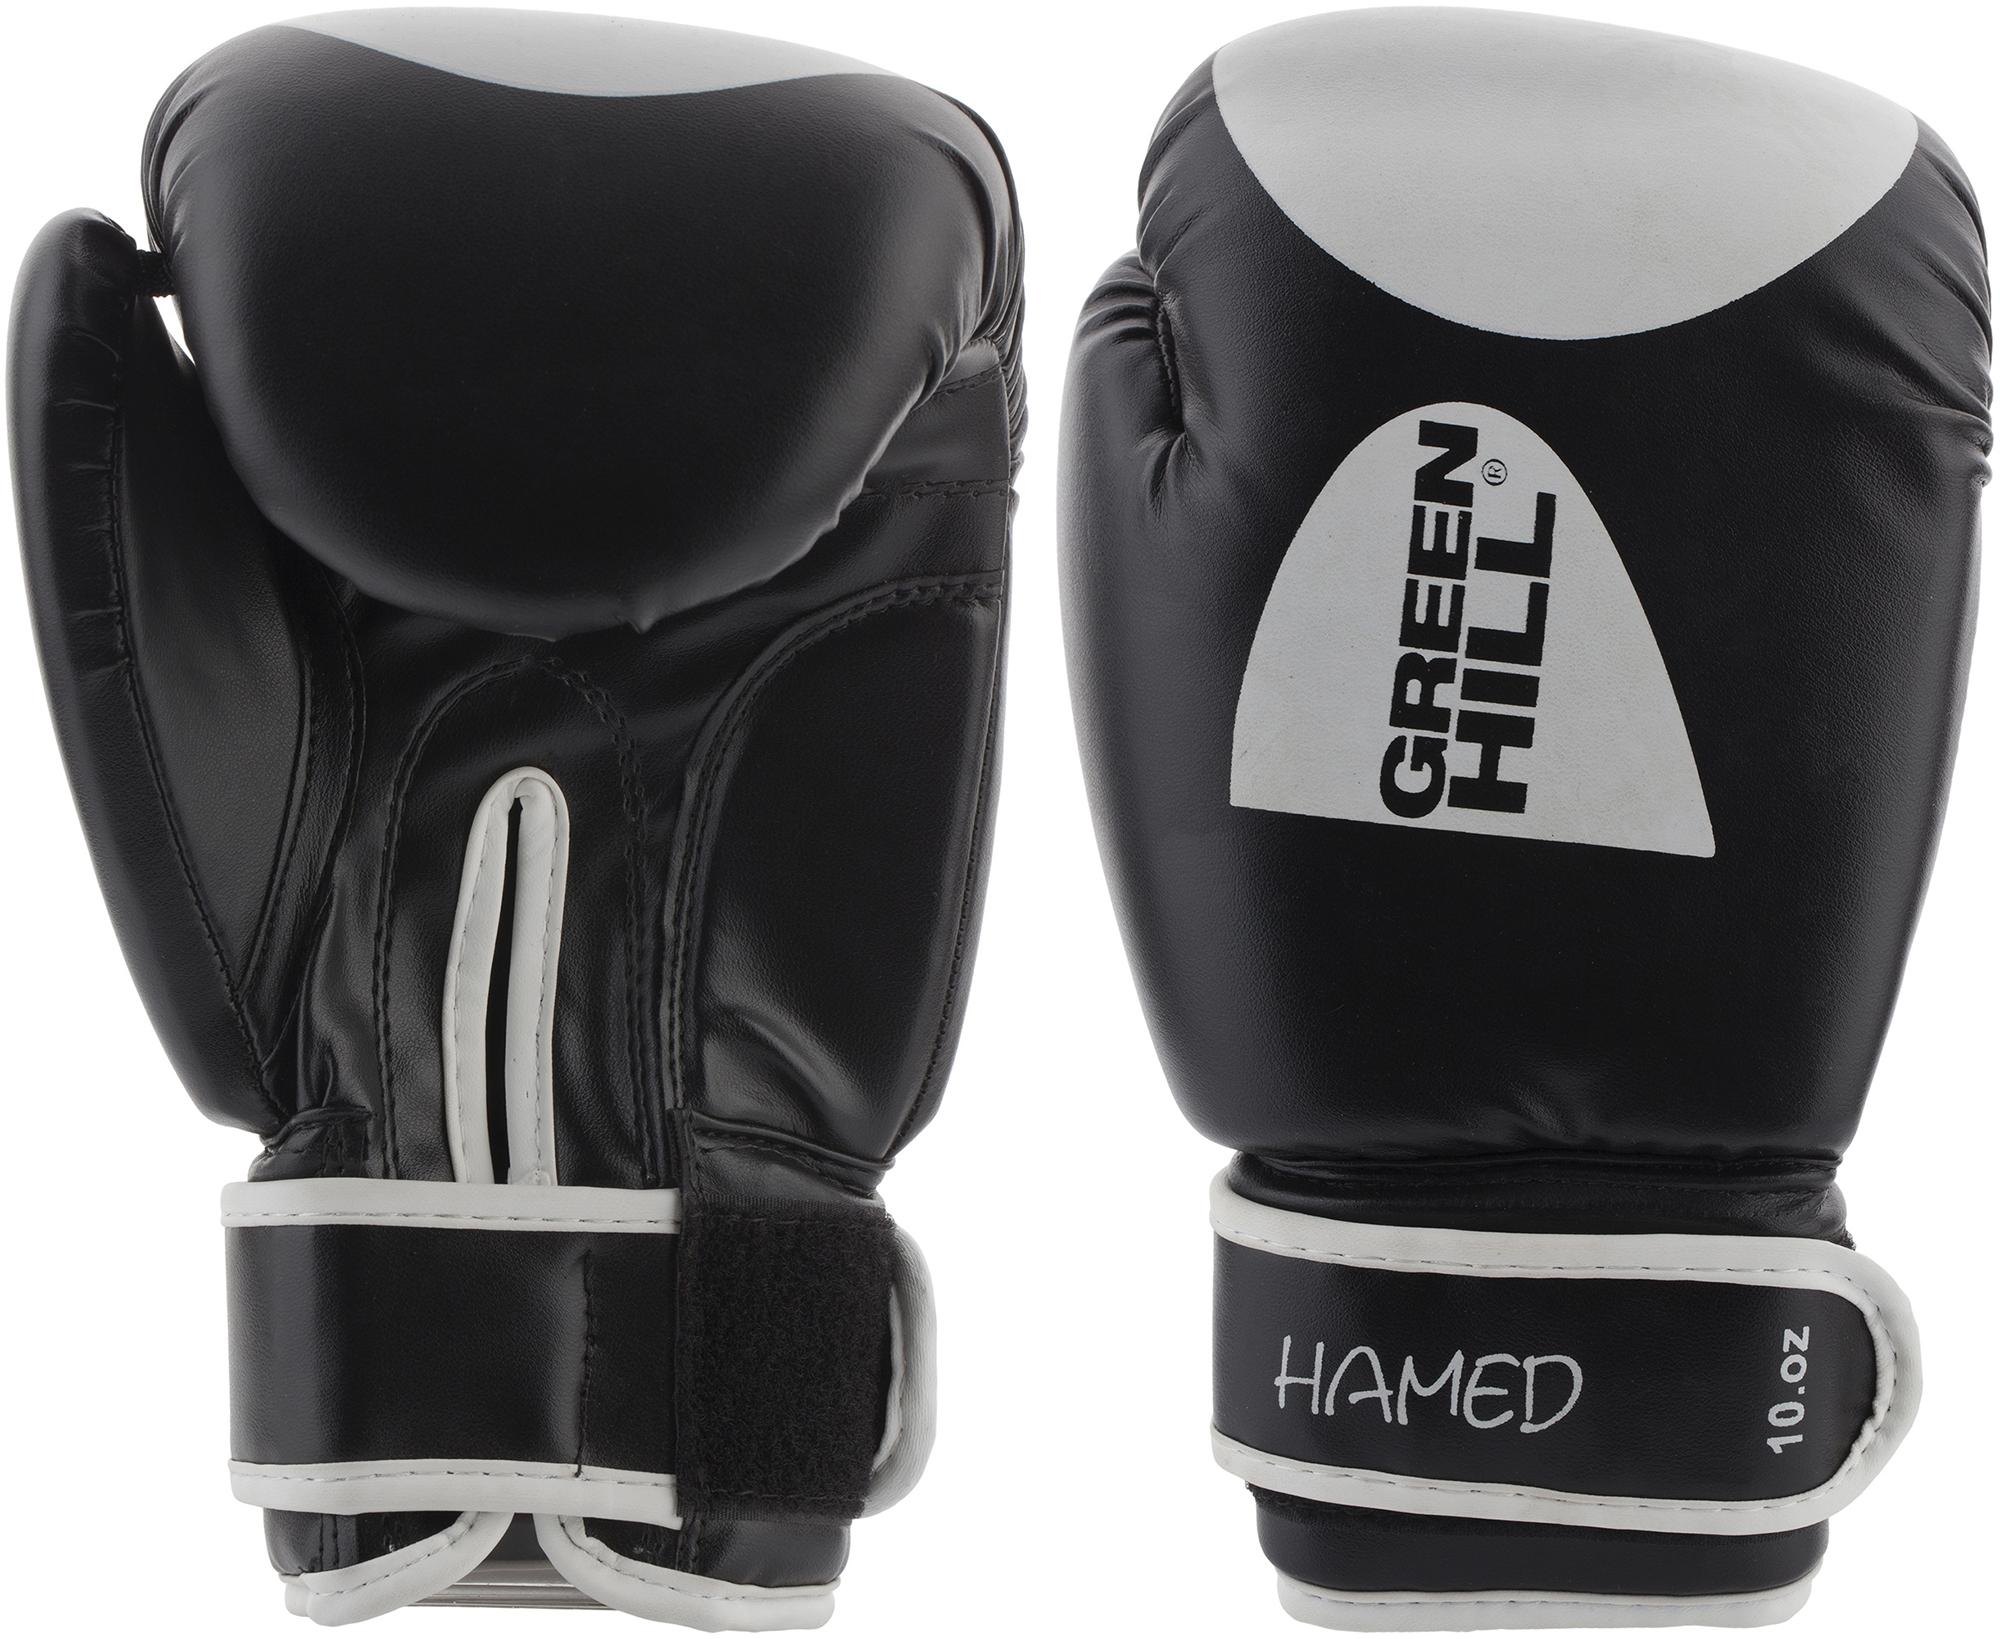 цена на Green Hill Перчатки боксерские Green Hill Hamed, размер 12 oz